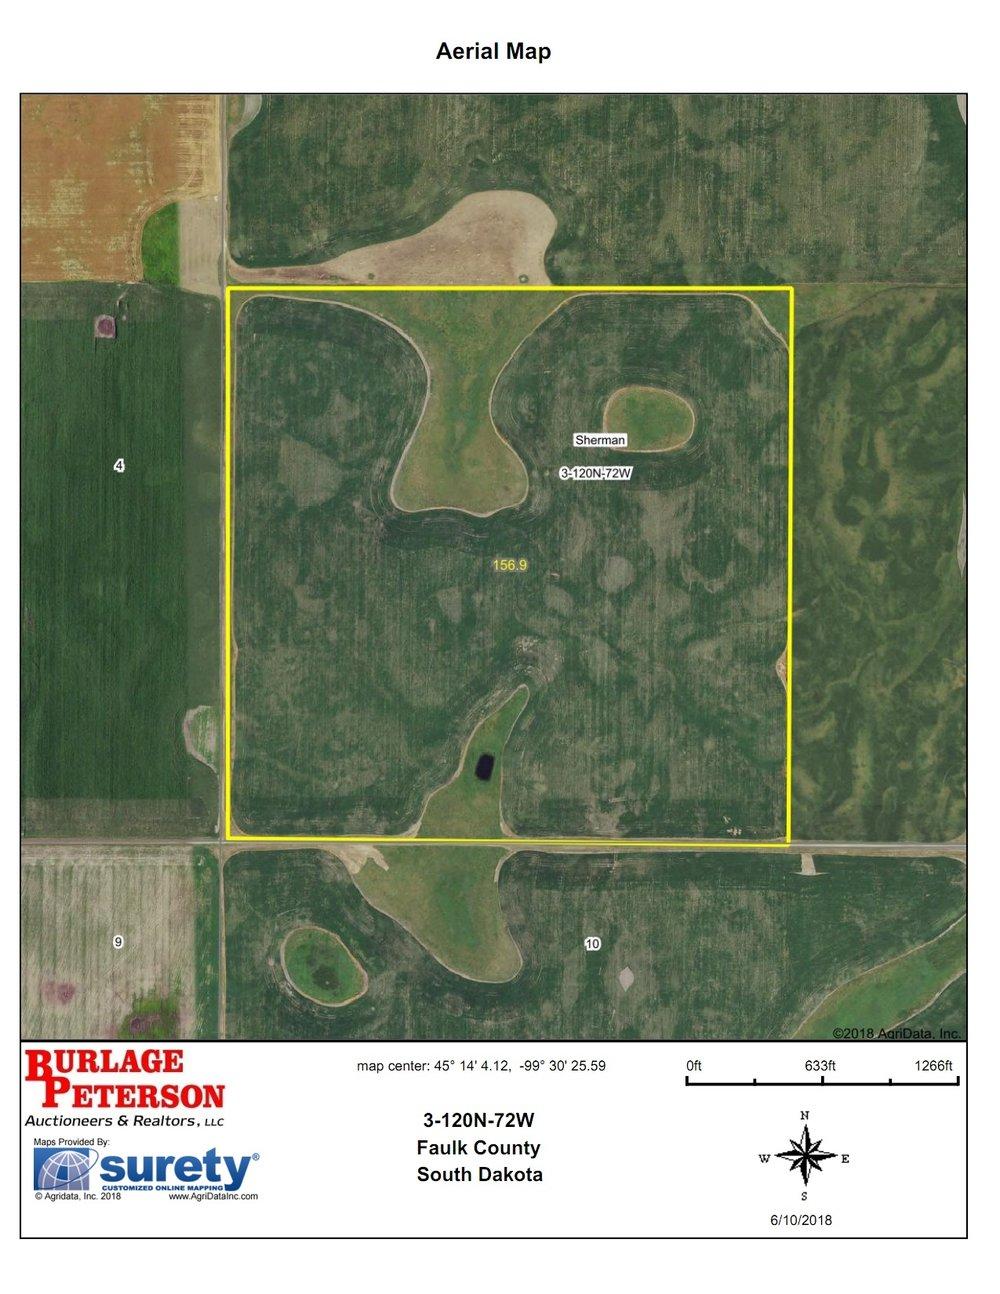 SW-Quarter-3-120-72-Aerial-Map-jpeg.jpg